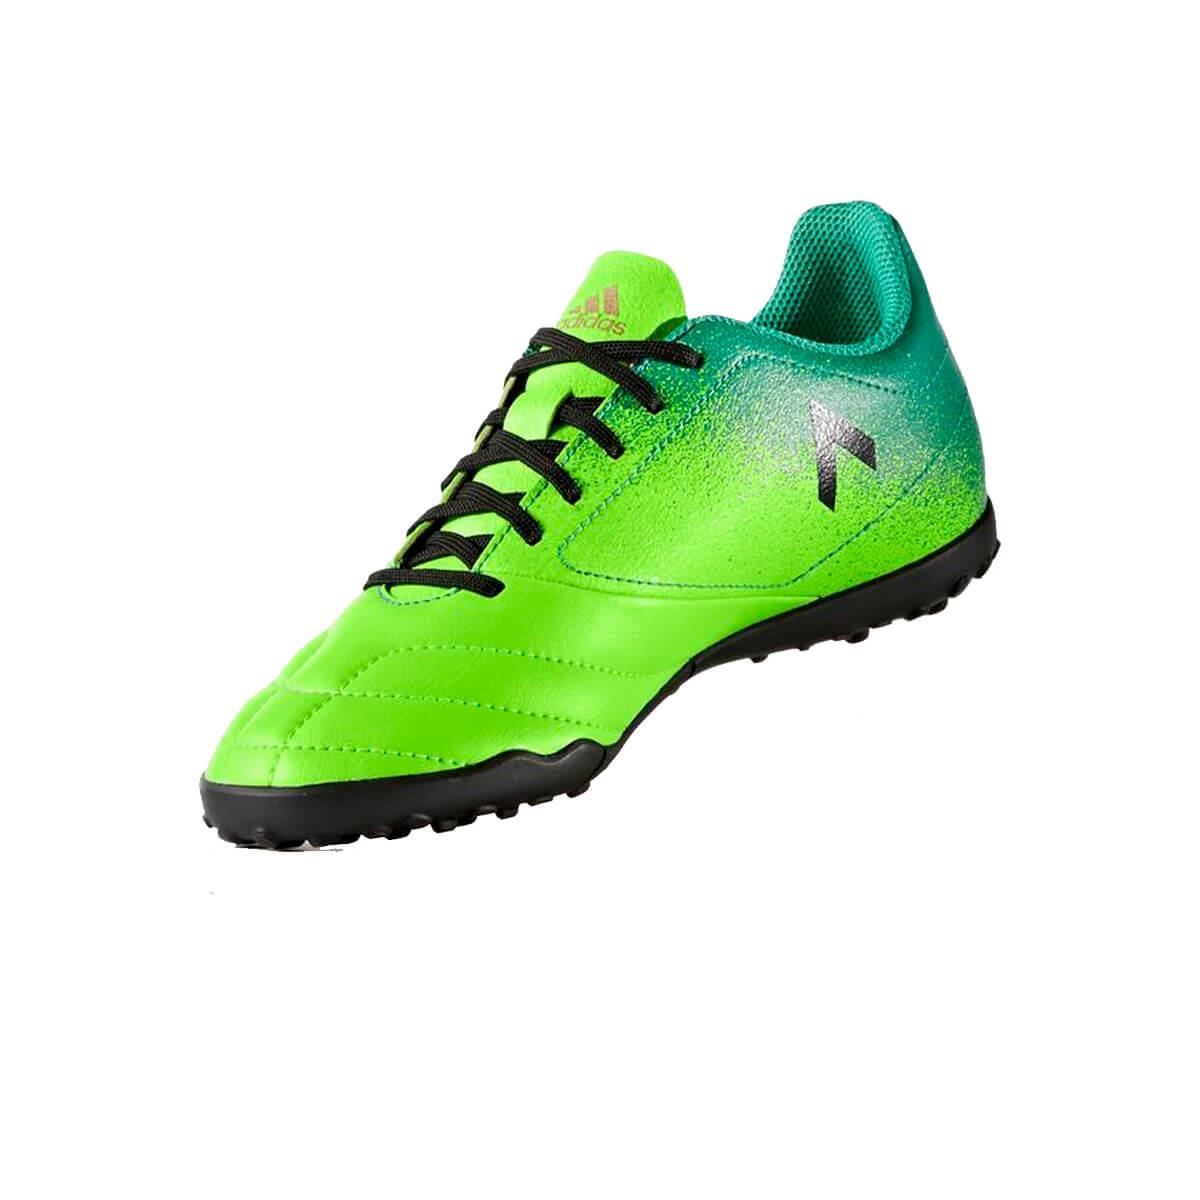 e5851b4b0a575 Chuteira Society Adidas Ace 17 4 TF Infantil